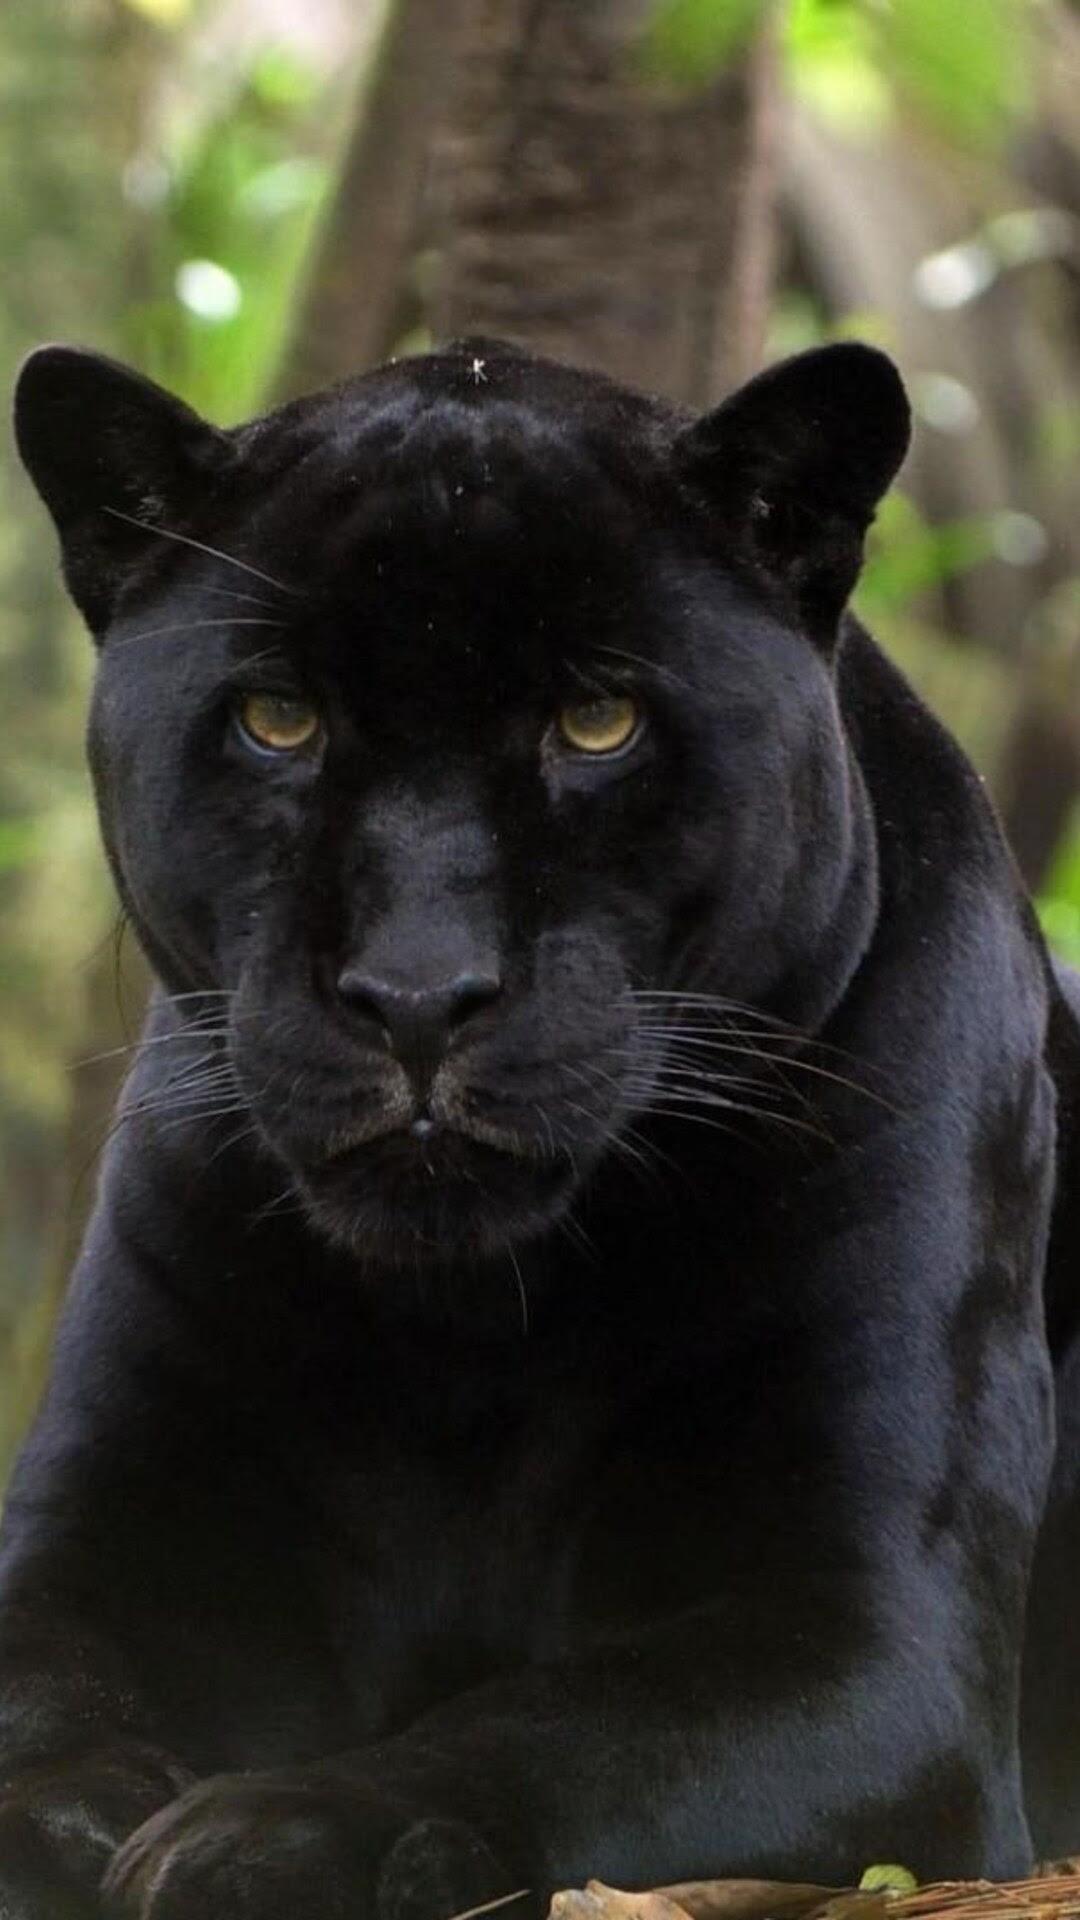 1080x1920 Black Panther 2 Iphone 7,6s,6 Plus, Pixel xl ...